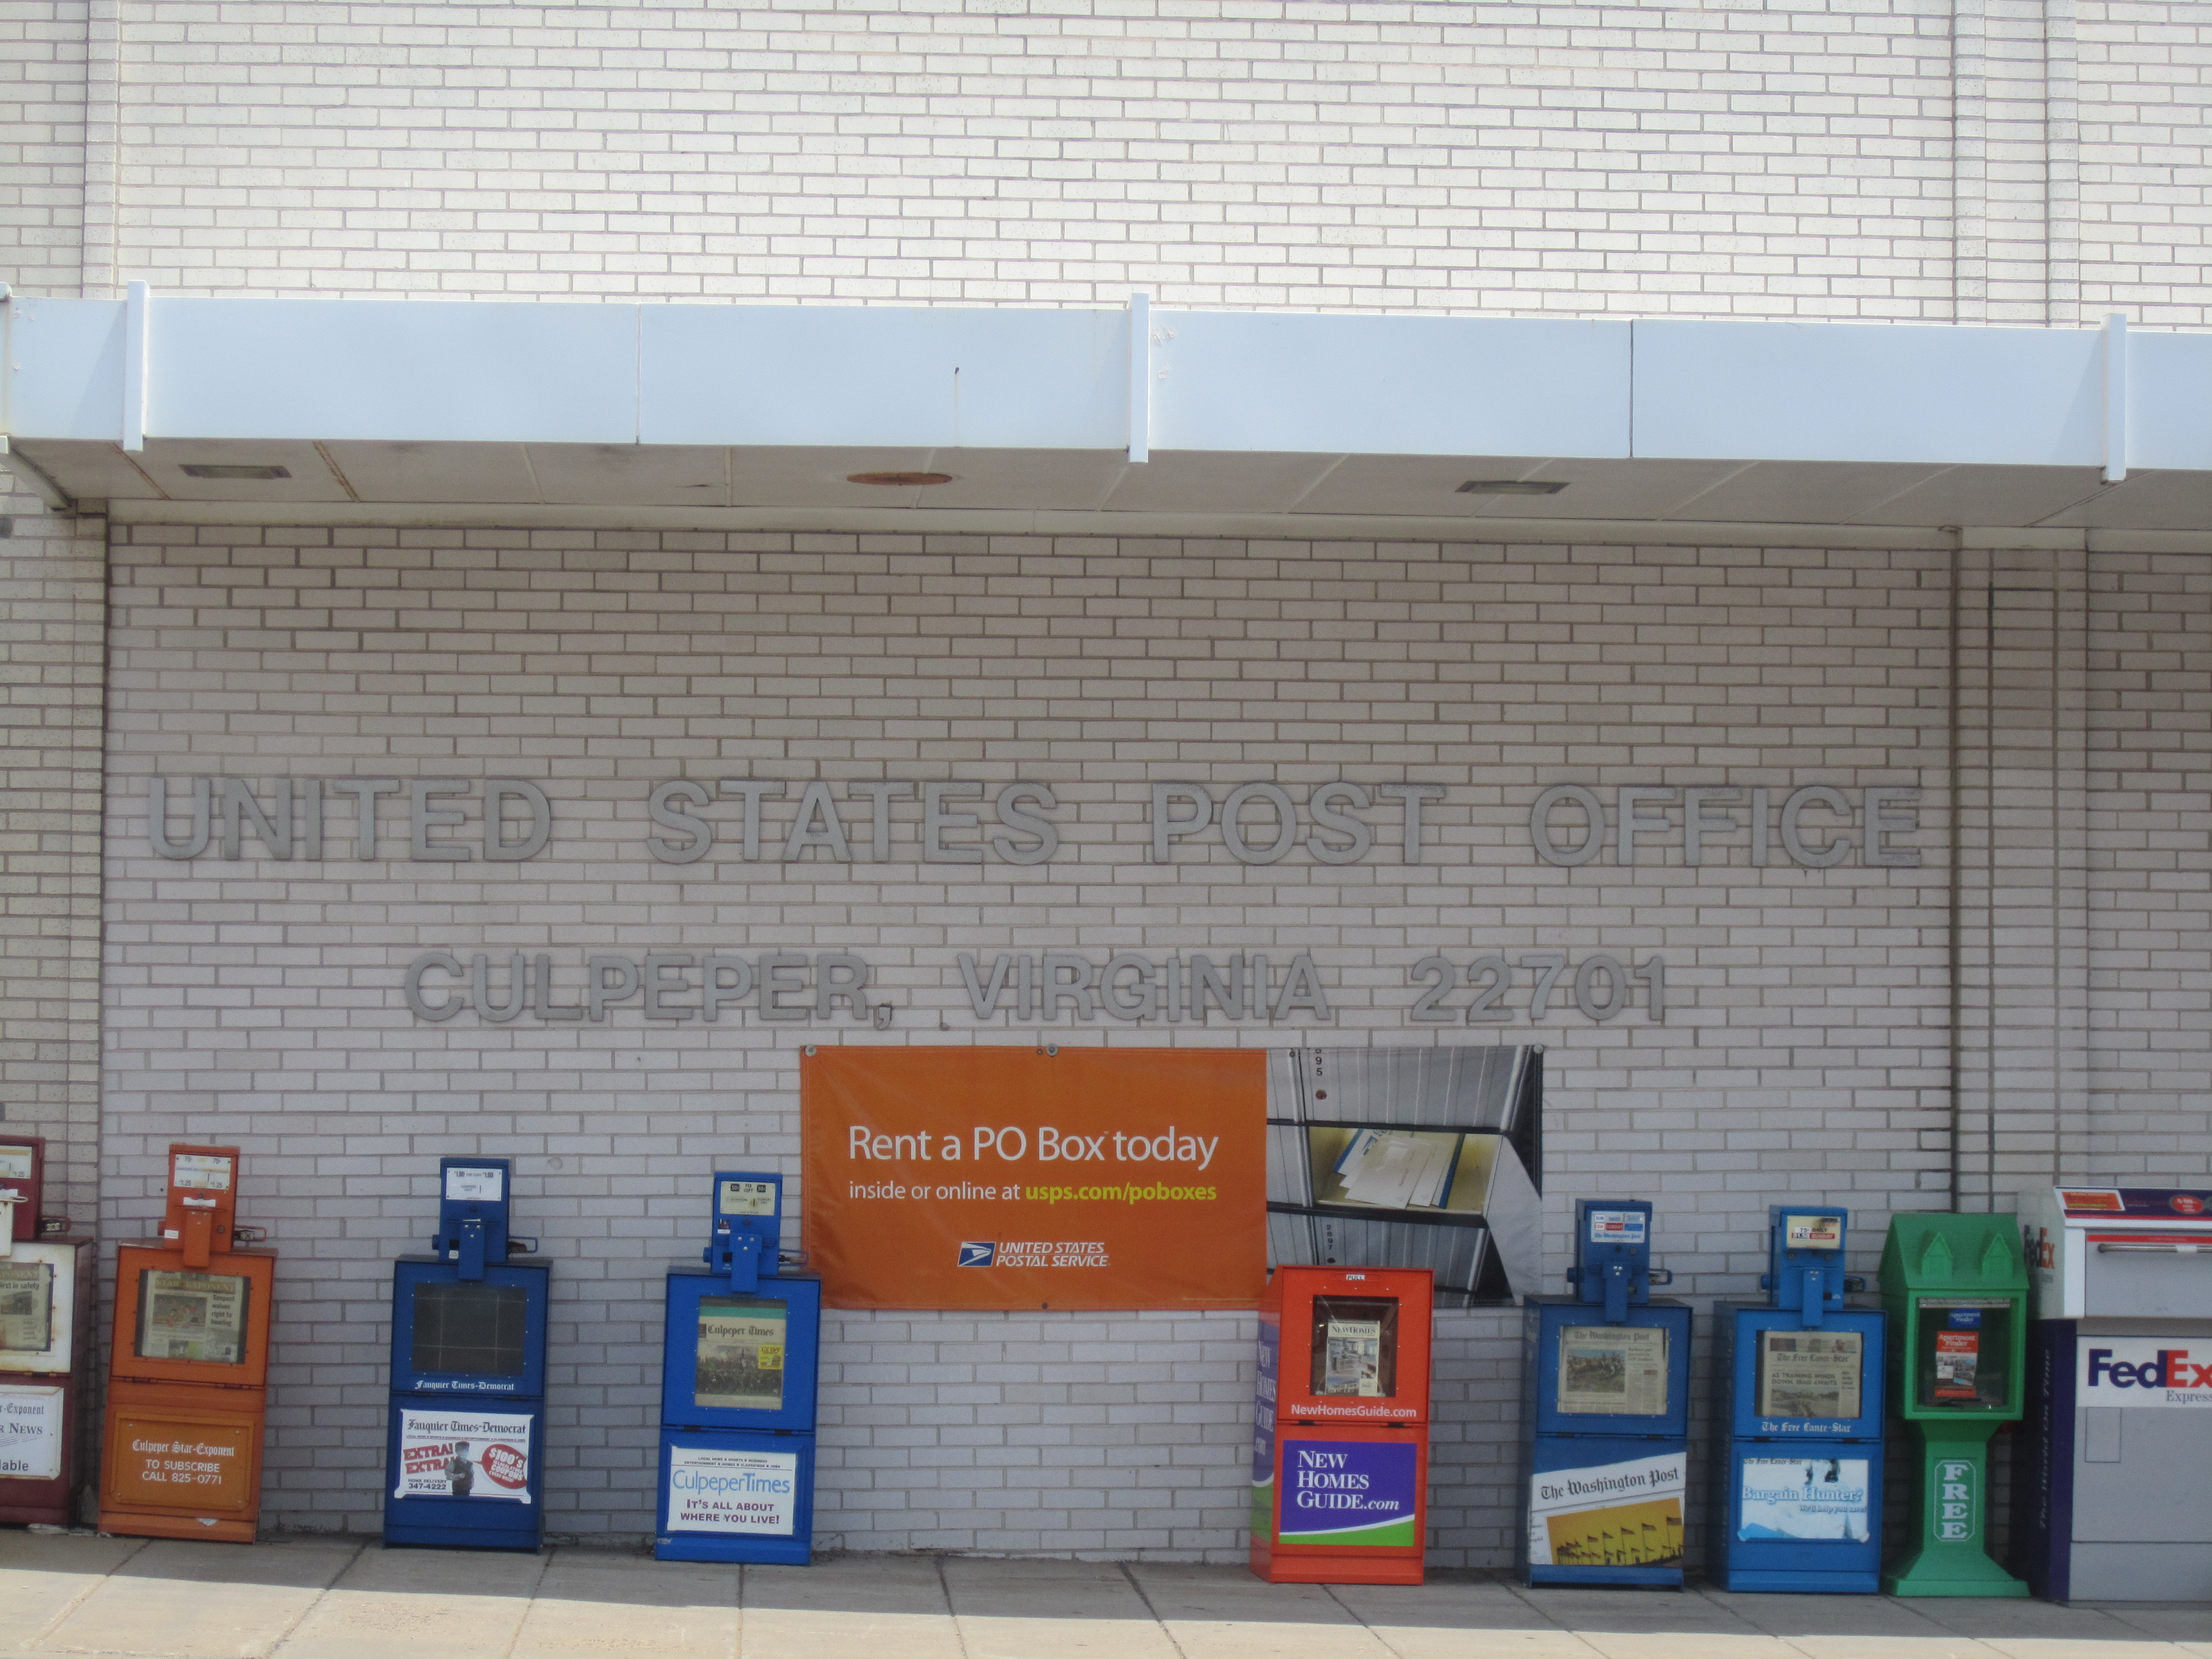 Photo of U.S. Post Office in Culpeper